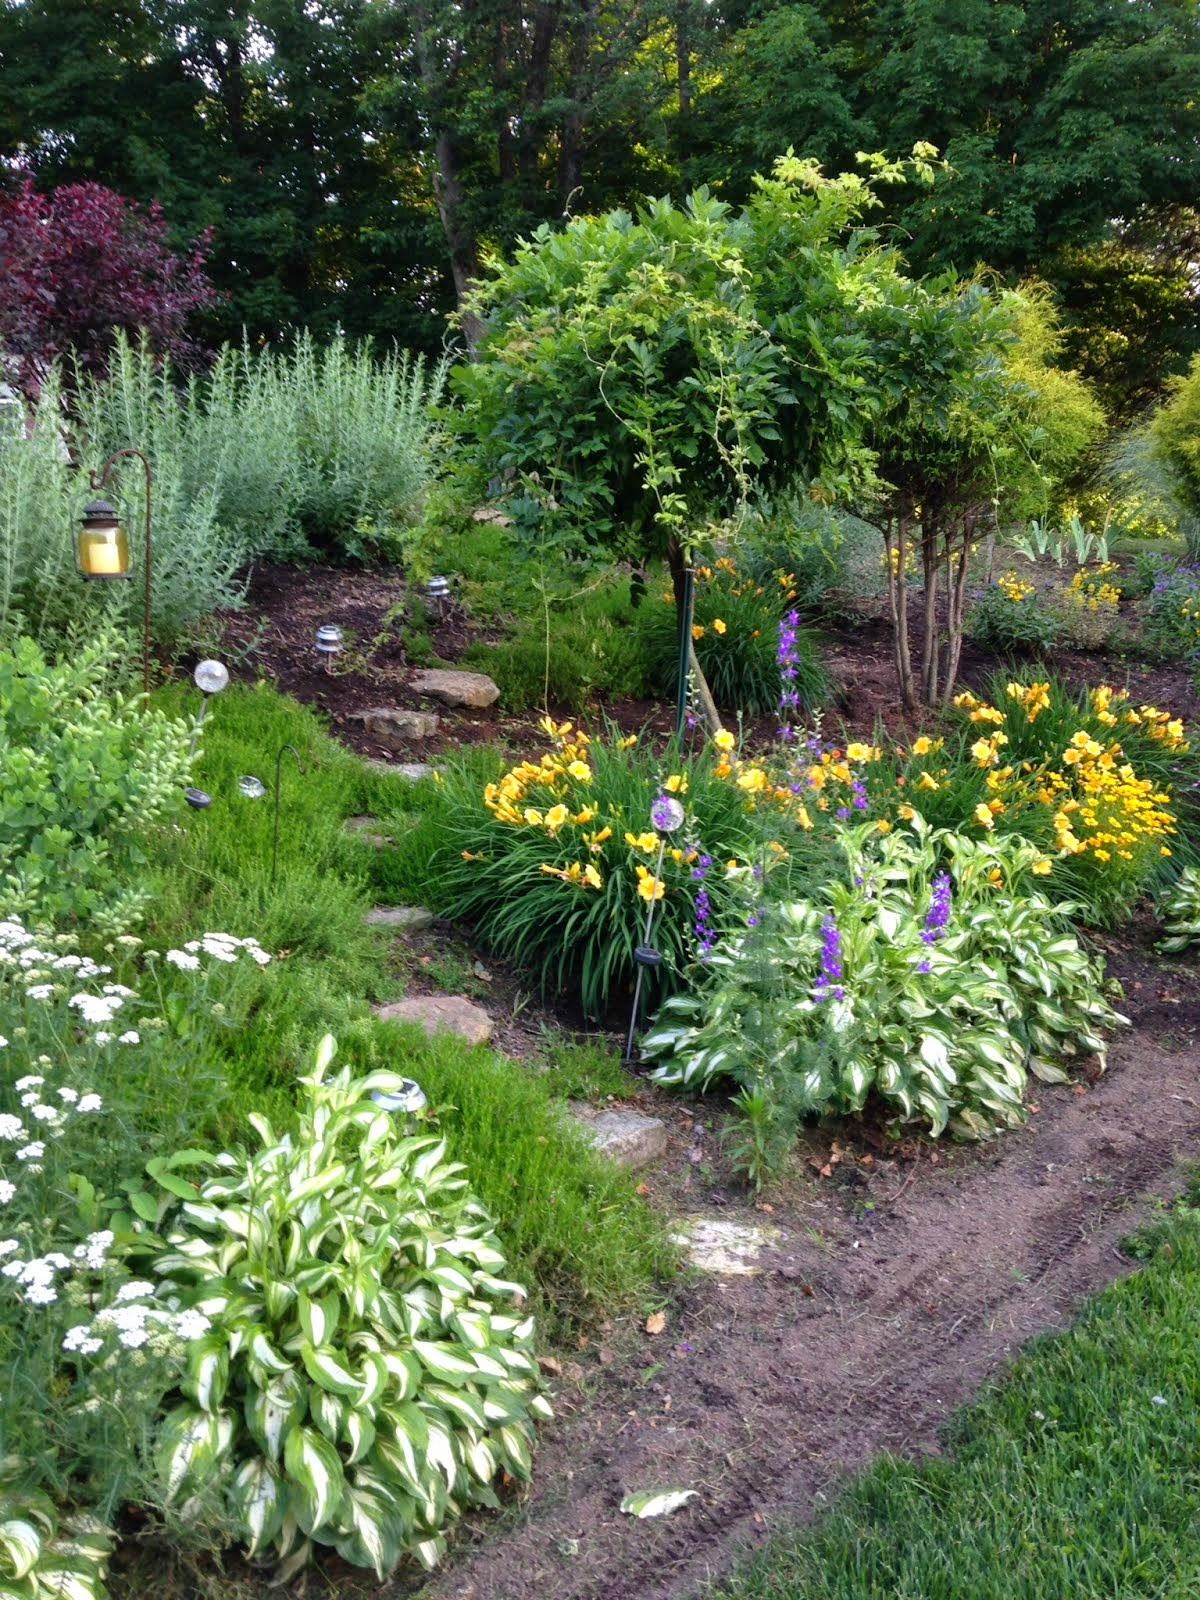 Wanda's Garden